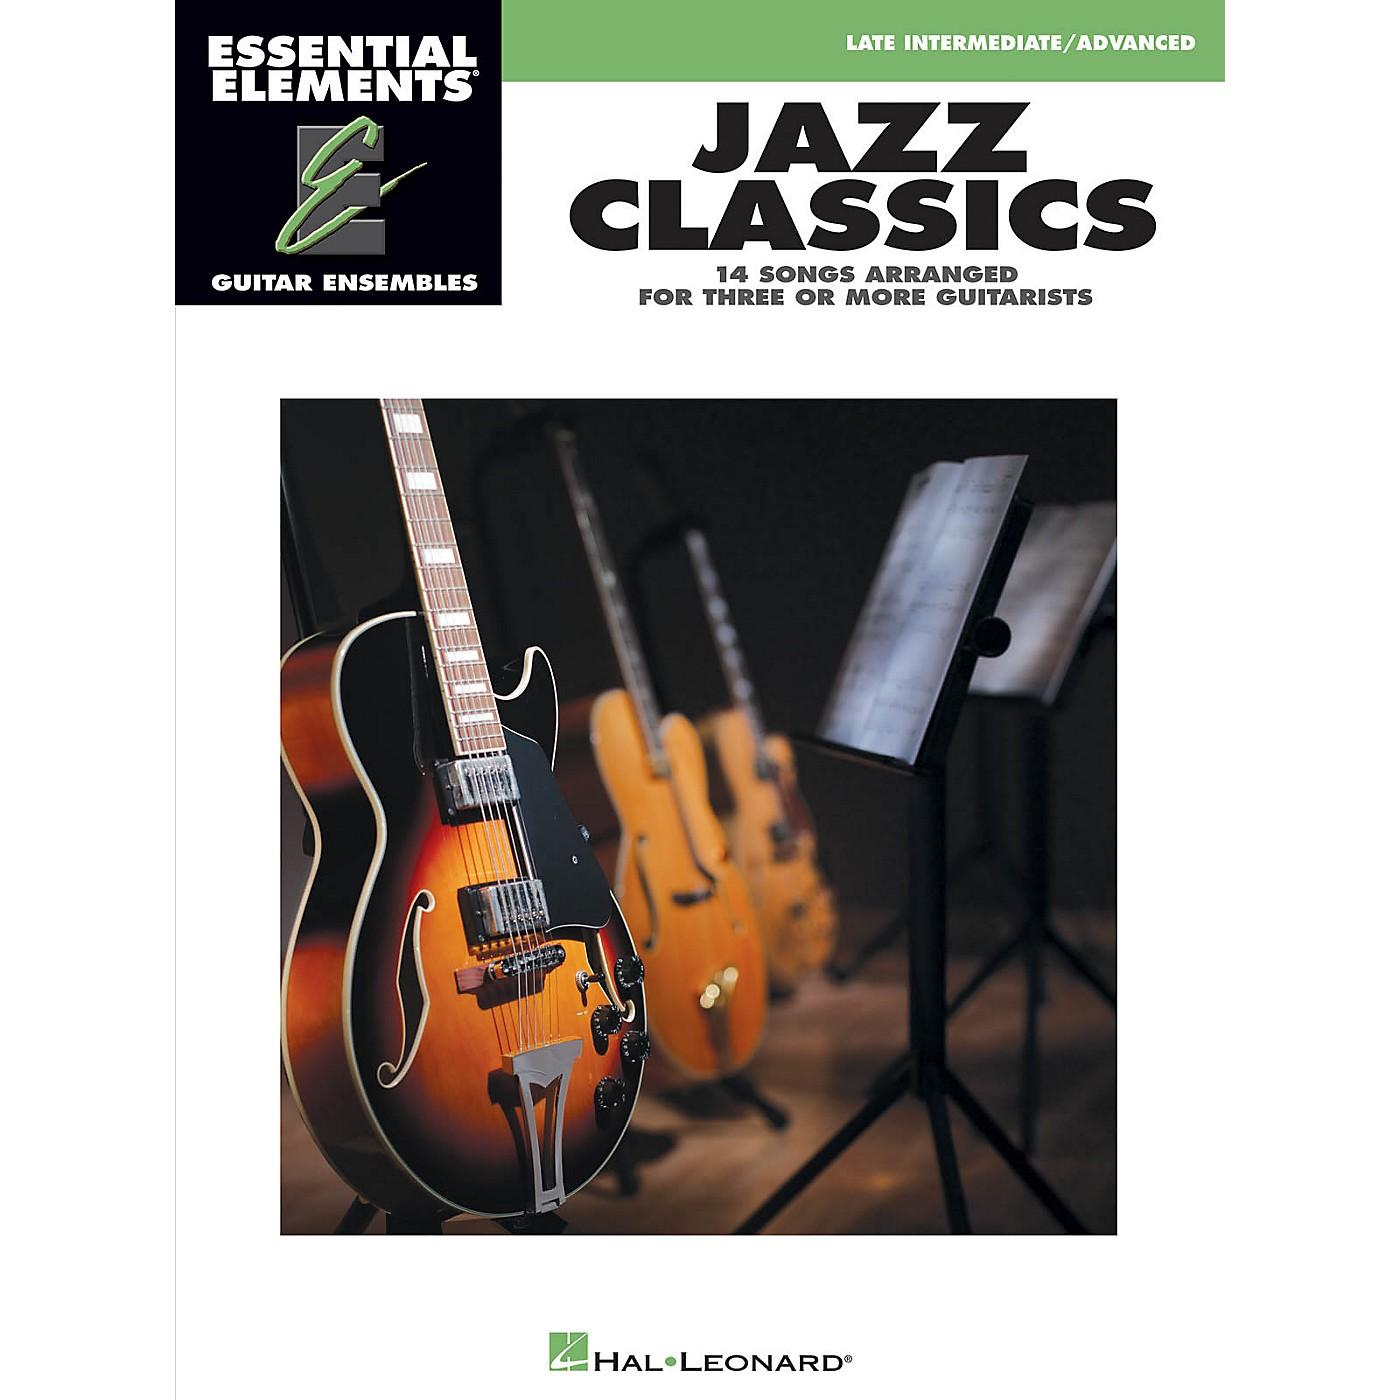 Hal Leonard Jazz Classics Essential Elements Guitar Series Softcover thumbnail